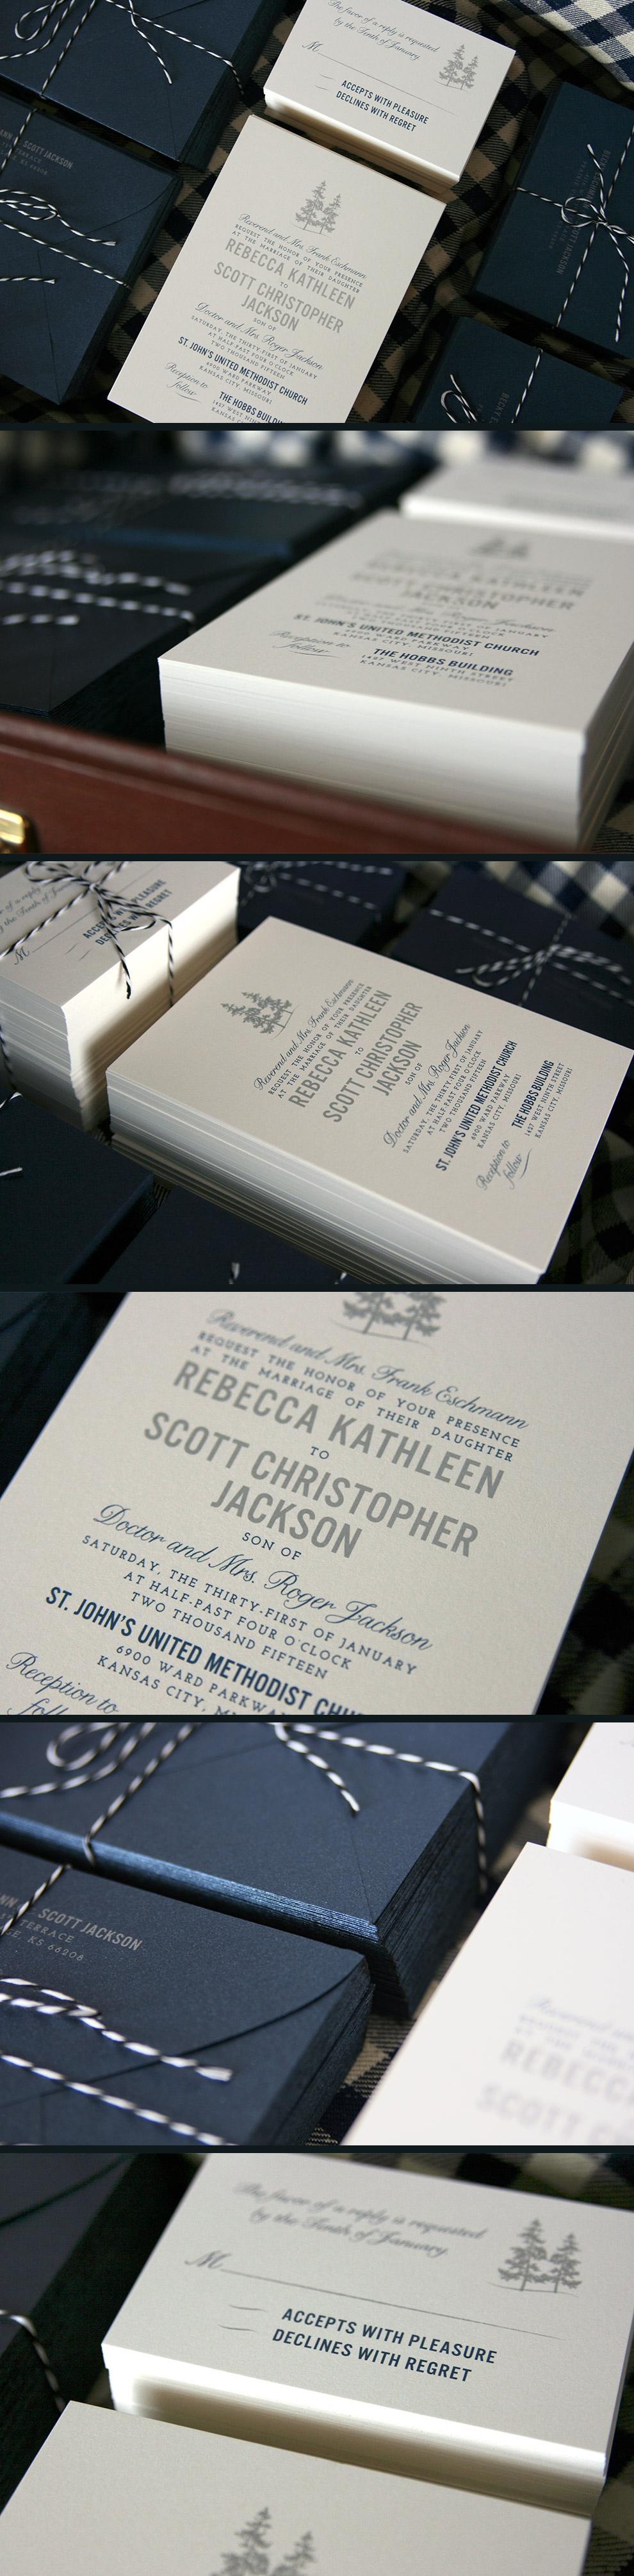 Rebecca and Scott s Wedding is the idyllic bination of winter